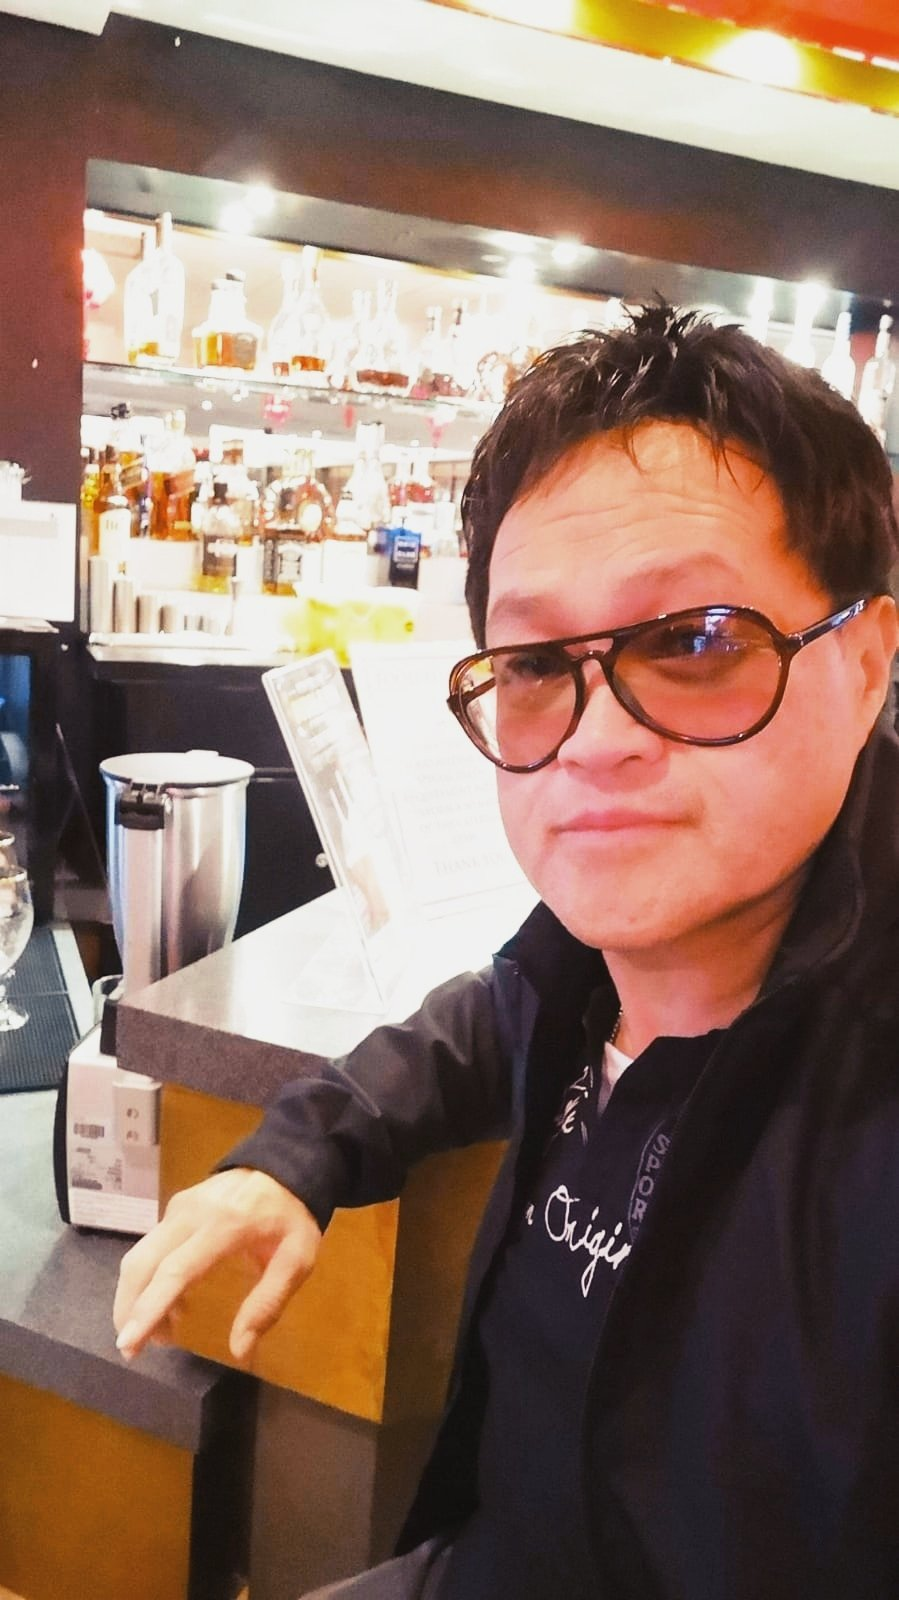 John Tsang from Lancashire,United Kingdom